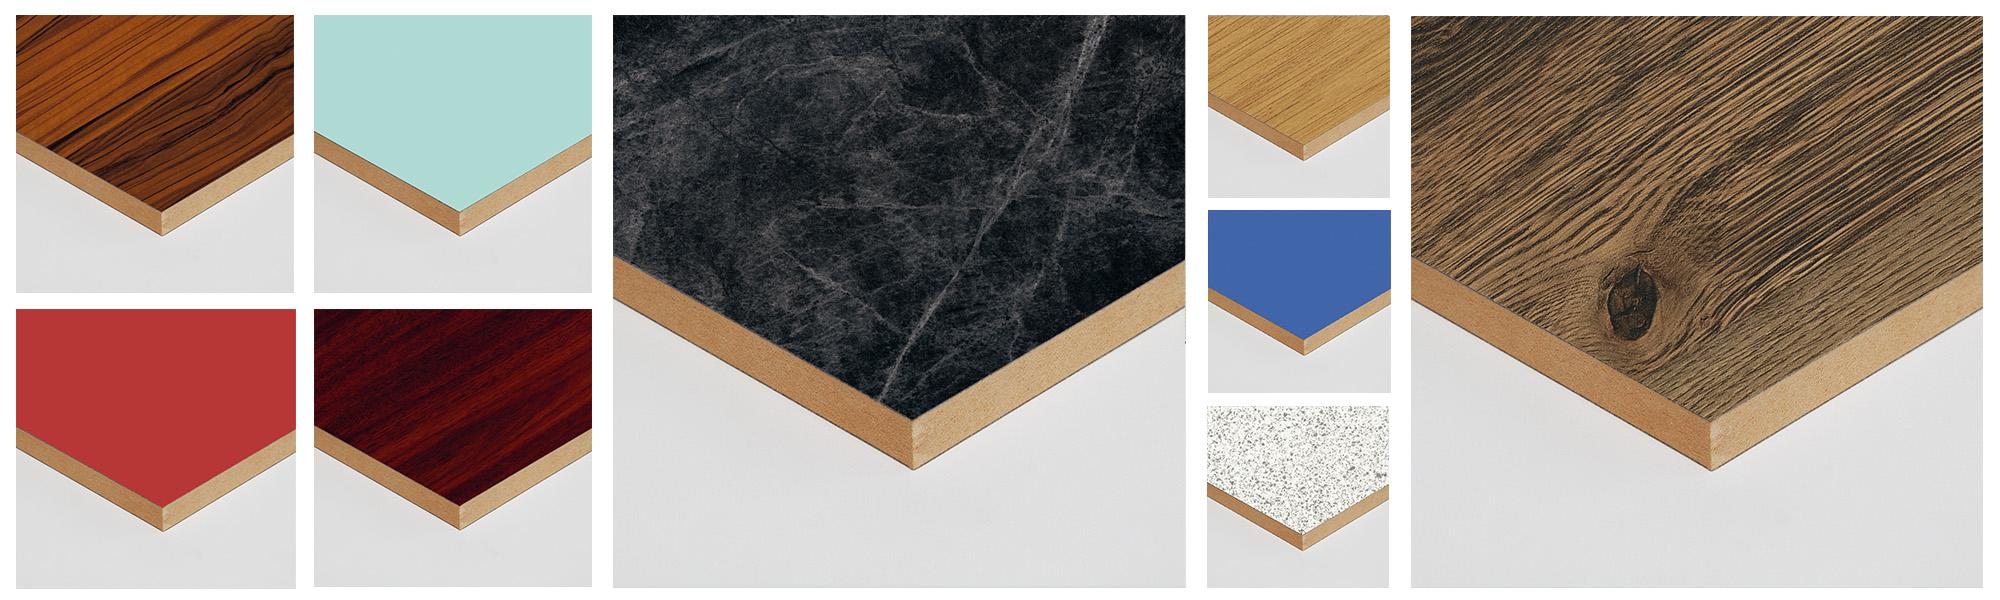 Laminated MDF Furniture Panels